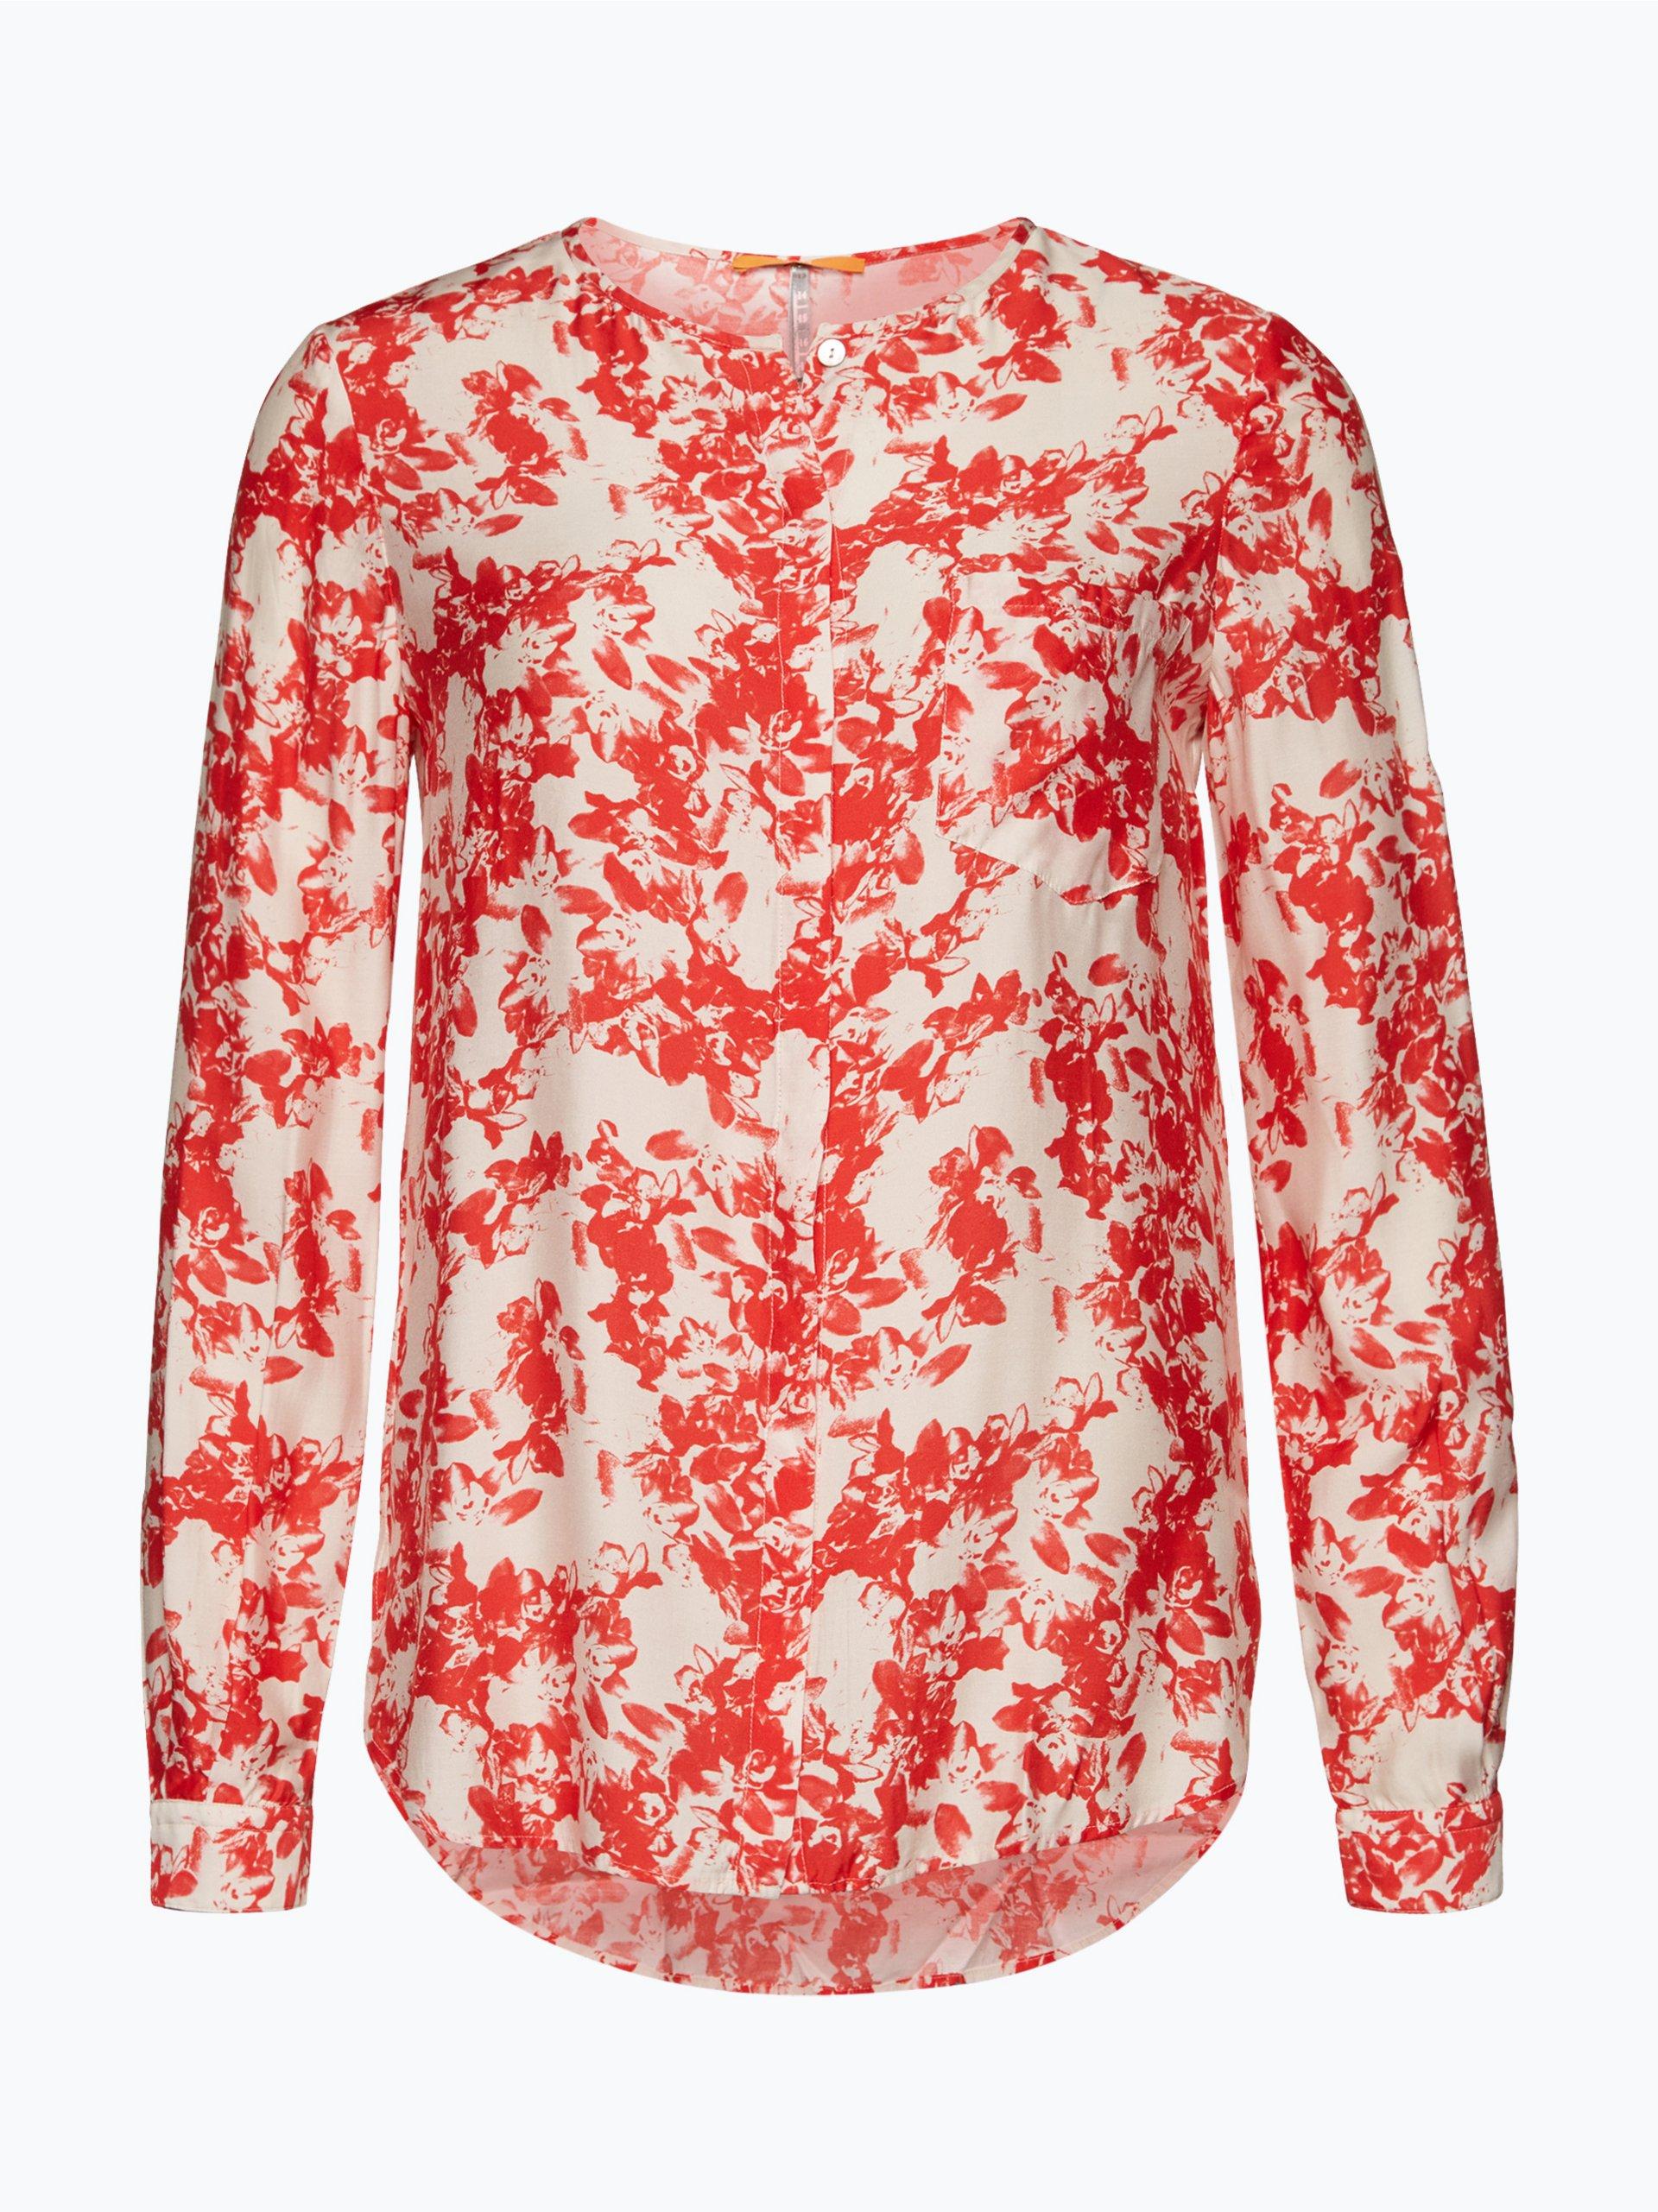 boss orange damen bluse eflo rot gemustert online kaufen peek und cloppenburg de. Black Bedroom Furniture Sets. Home Design Ideas